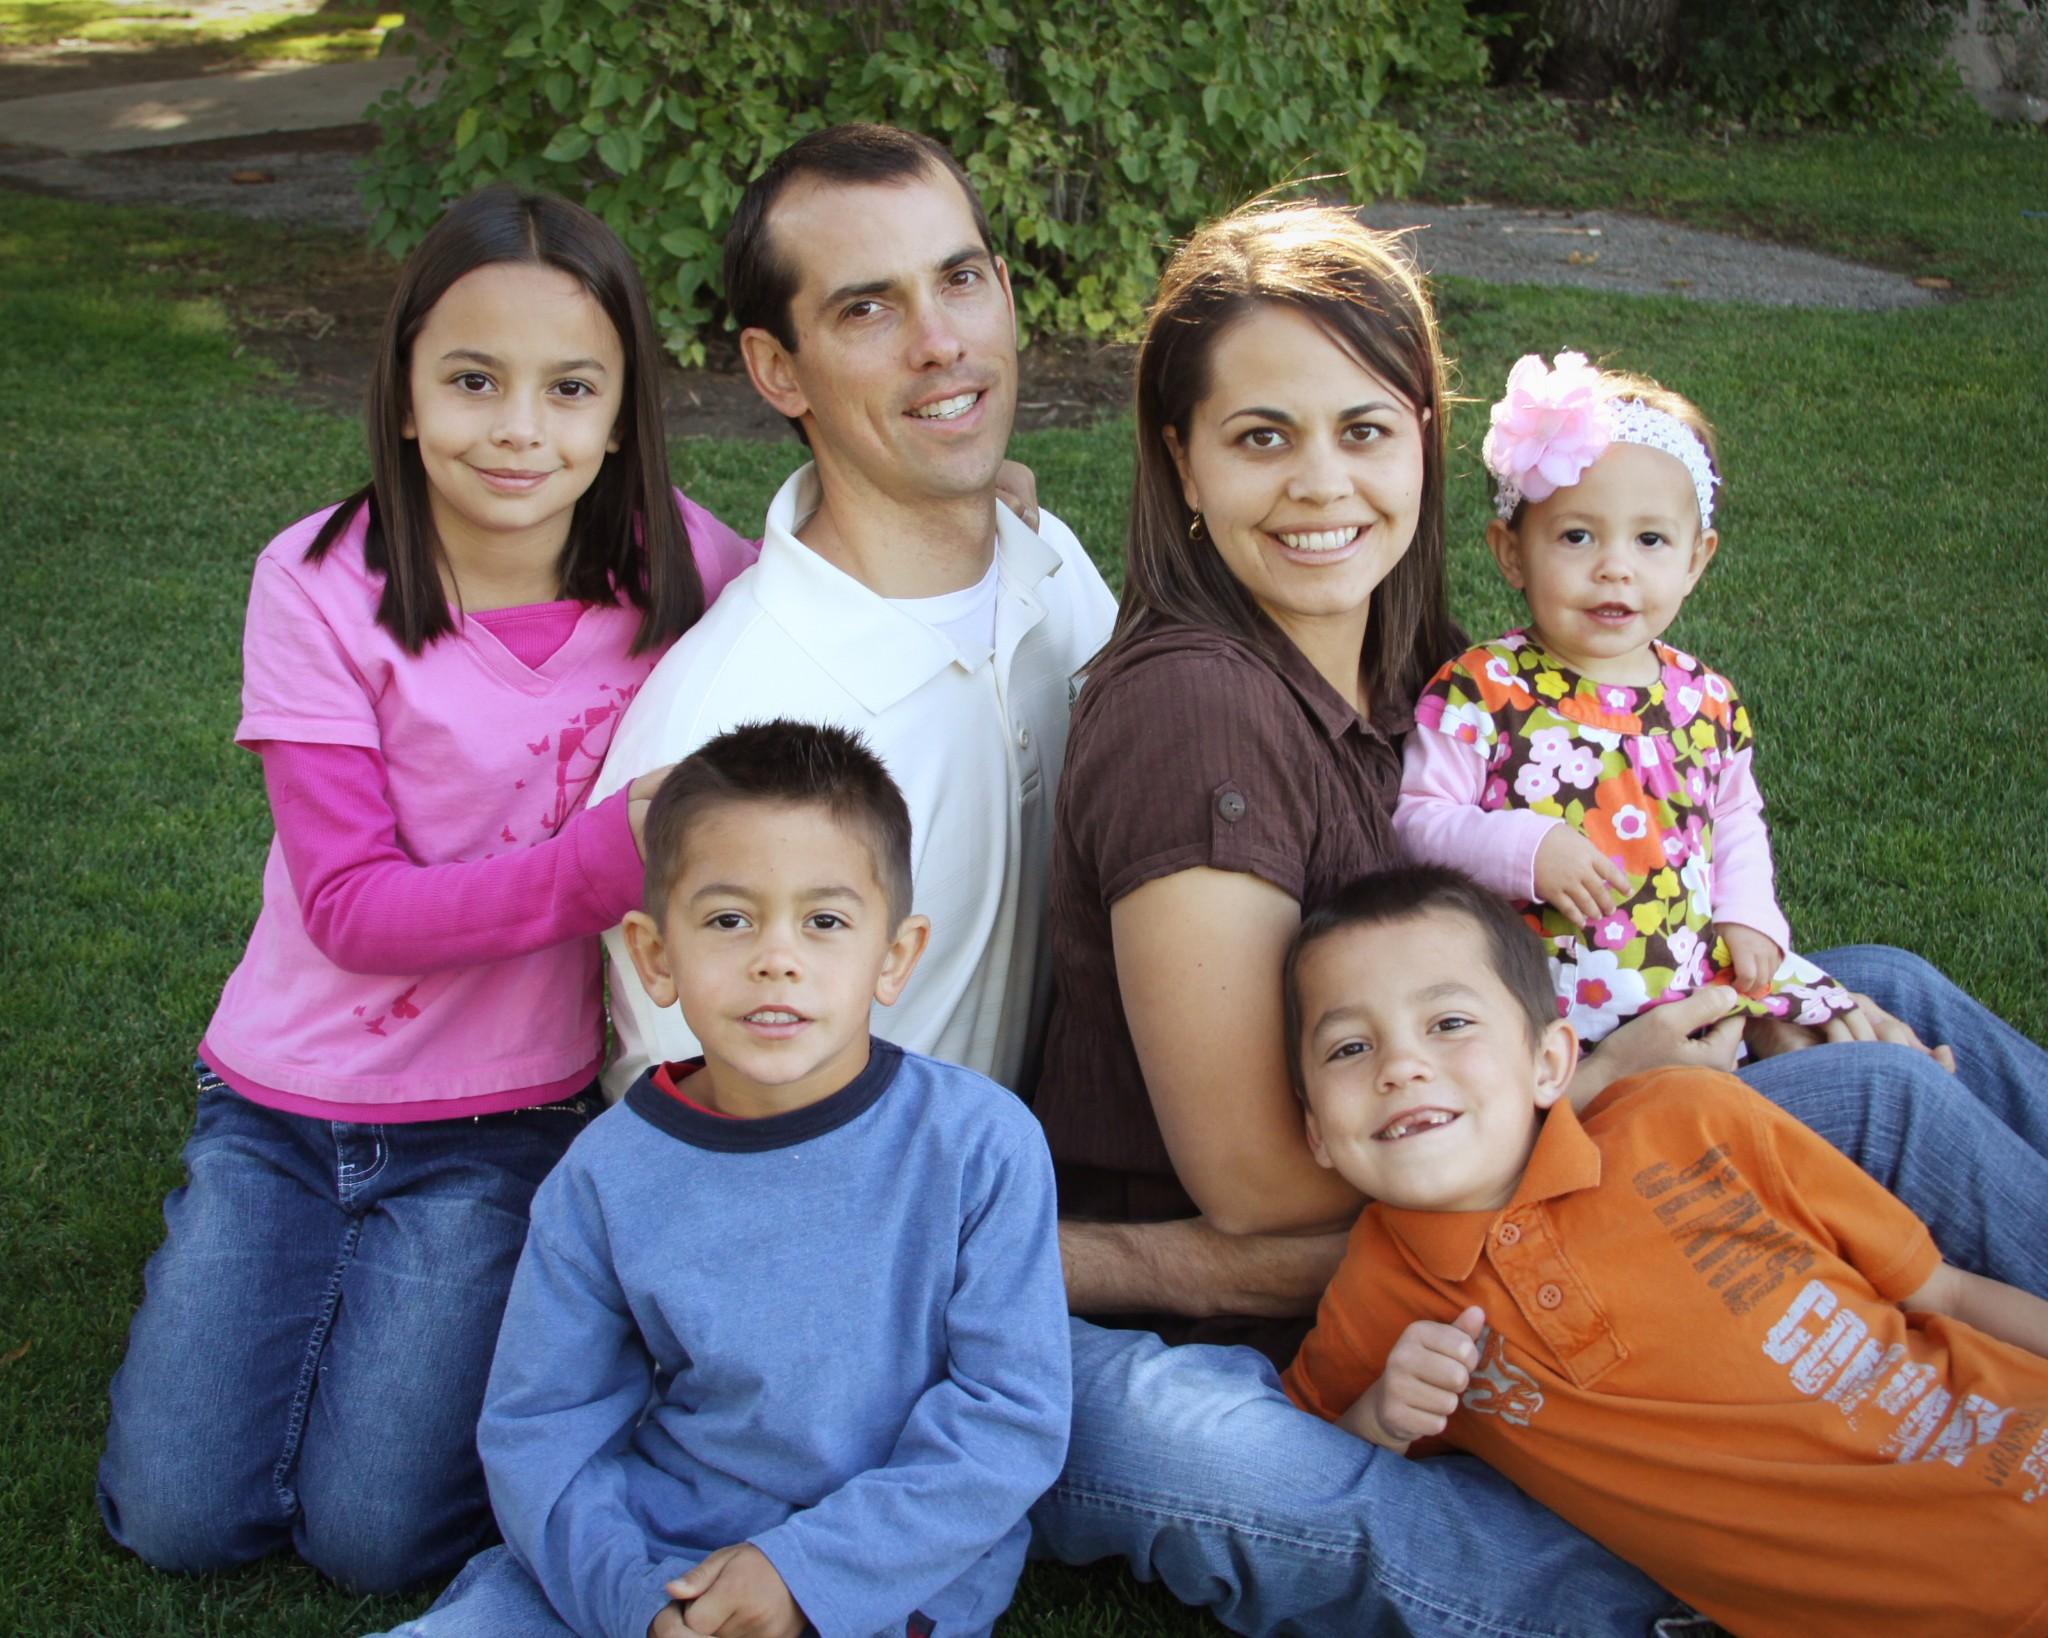 FamilyPortraits 001.jpg